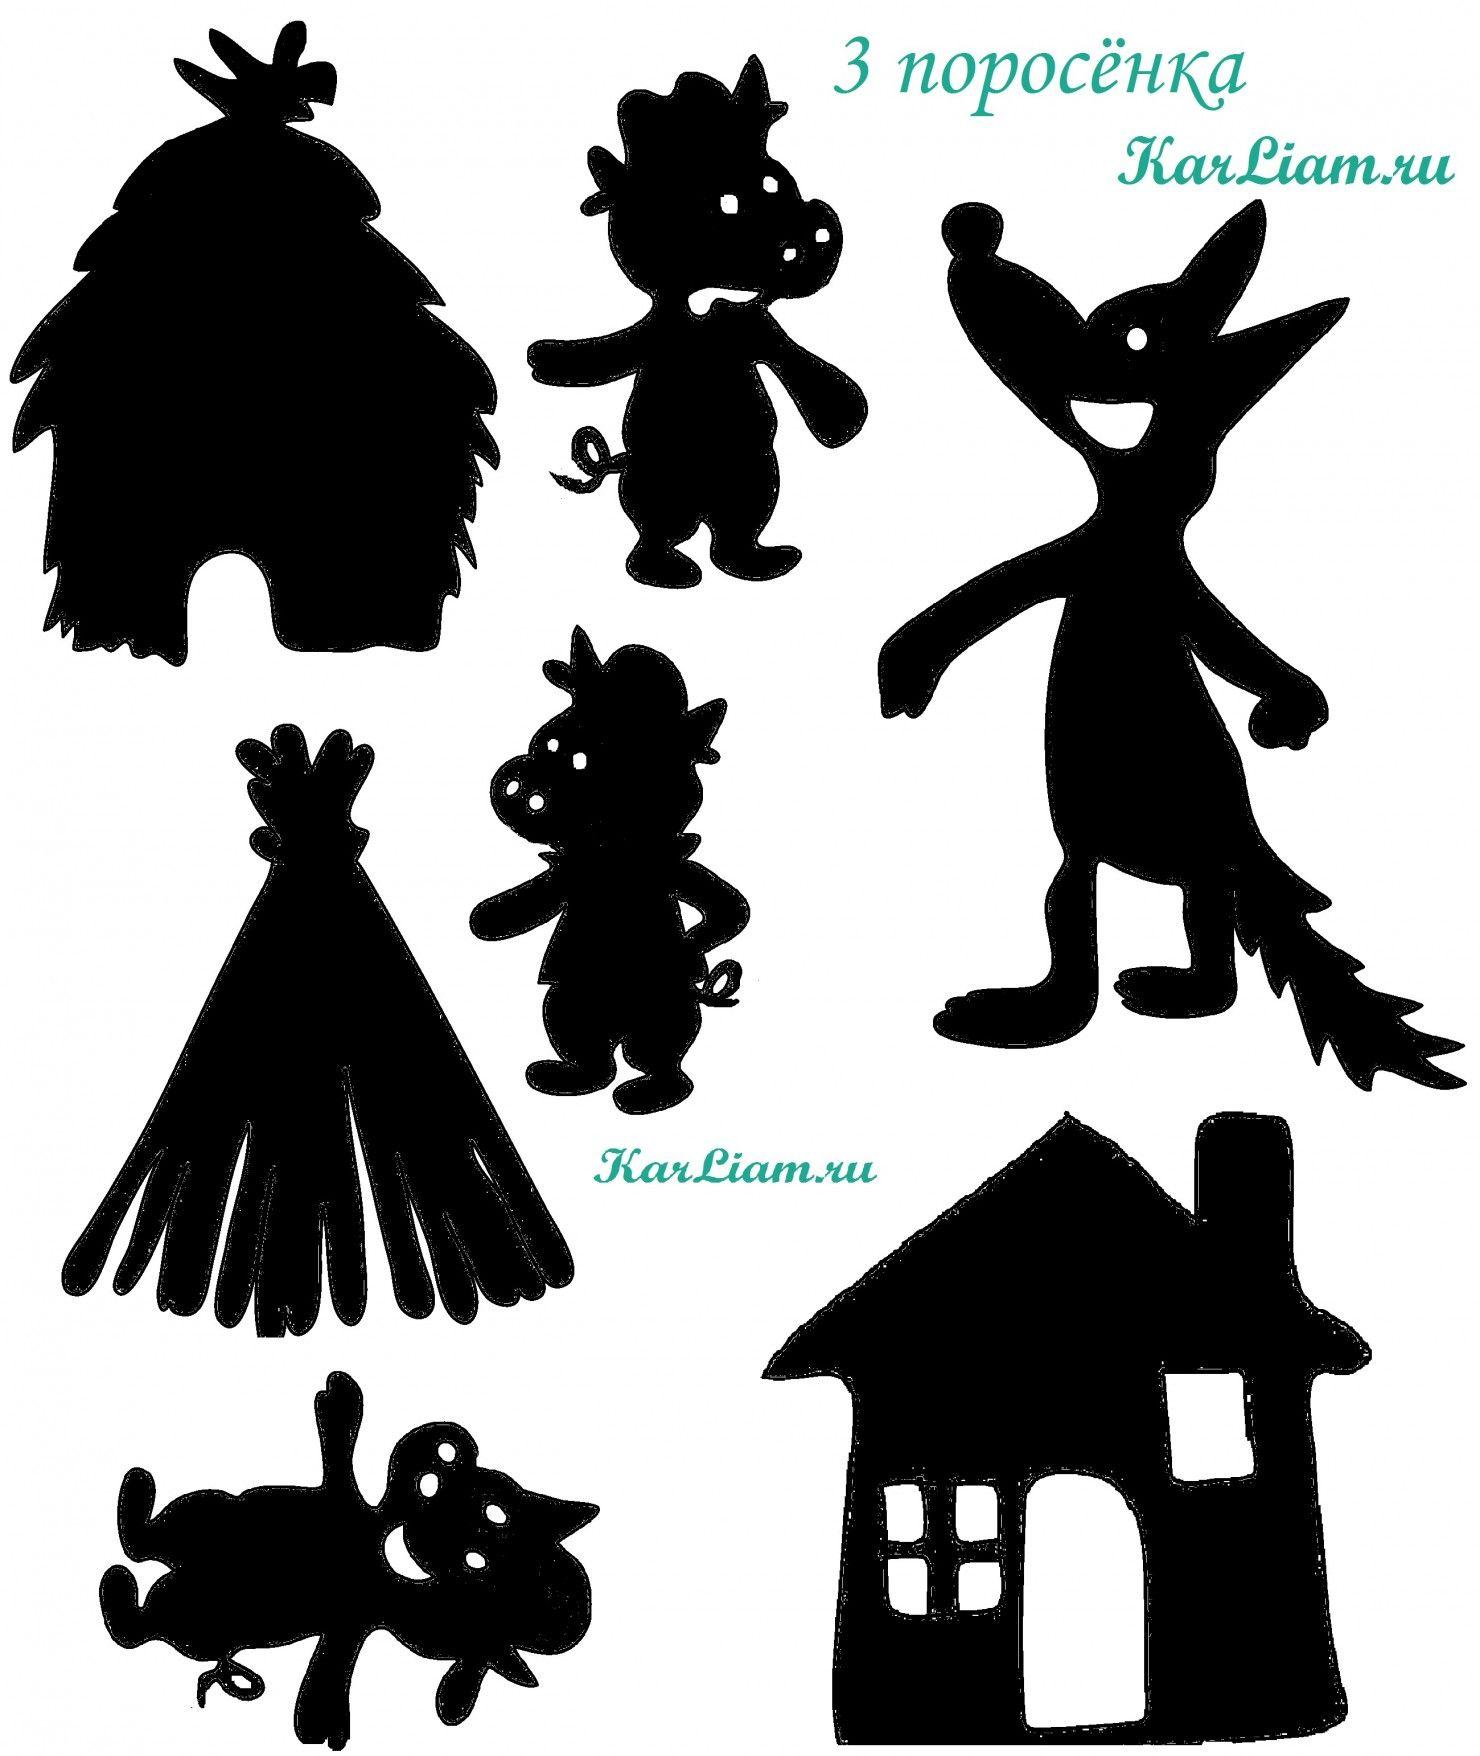 free shadow puppet templates - kell kek